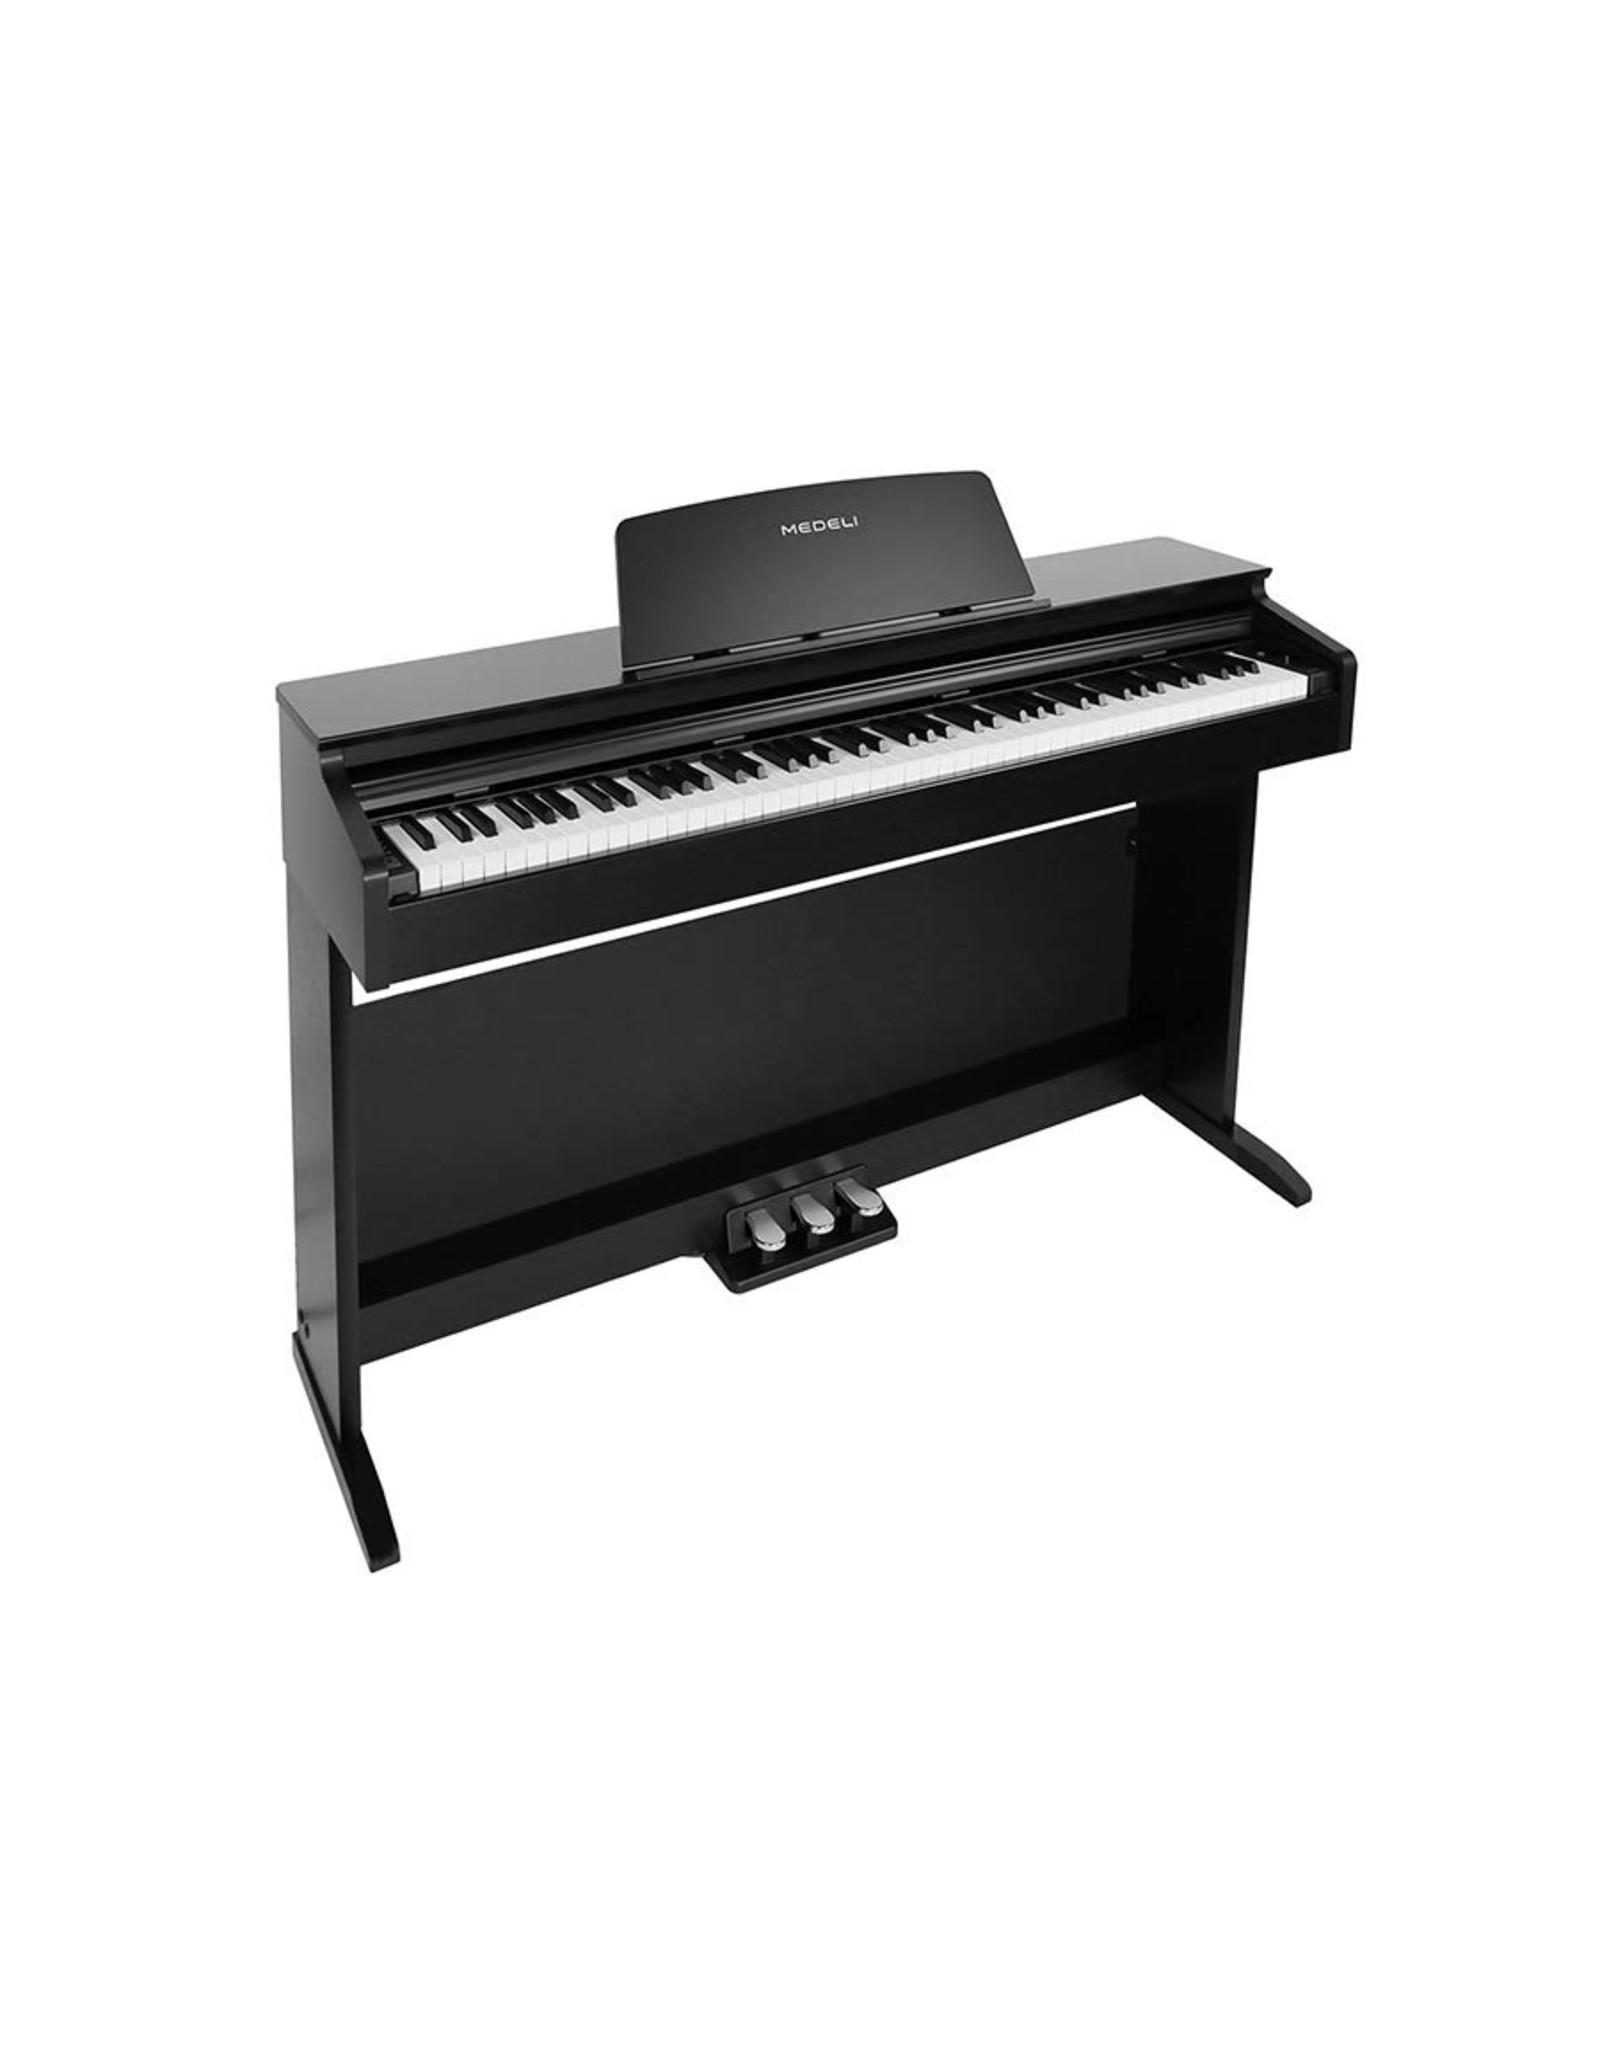 Medeli Medeli Intermezzo Series digitale piano DP260